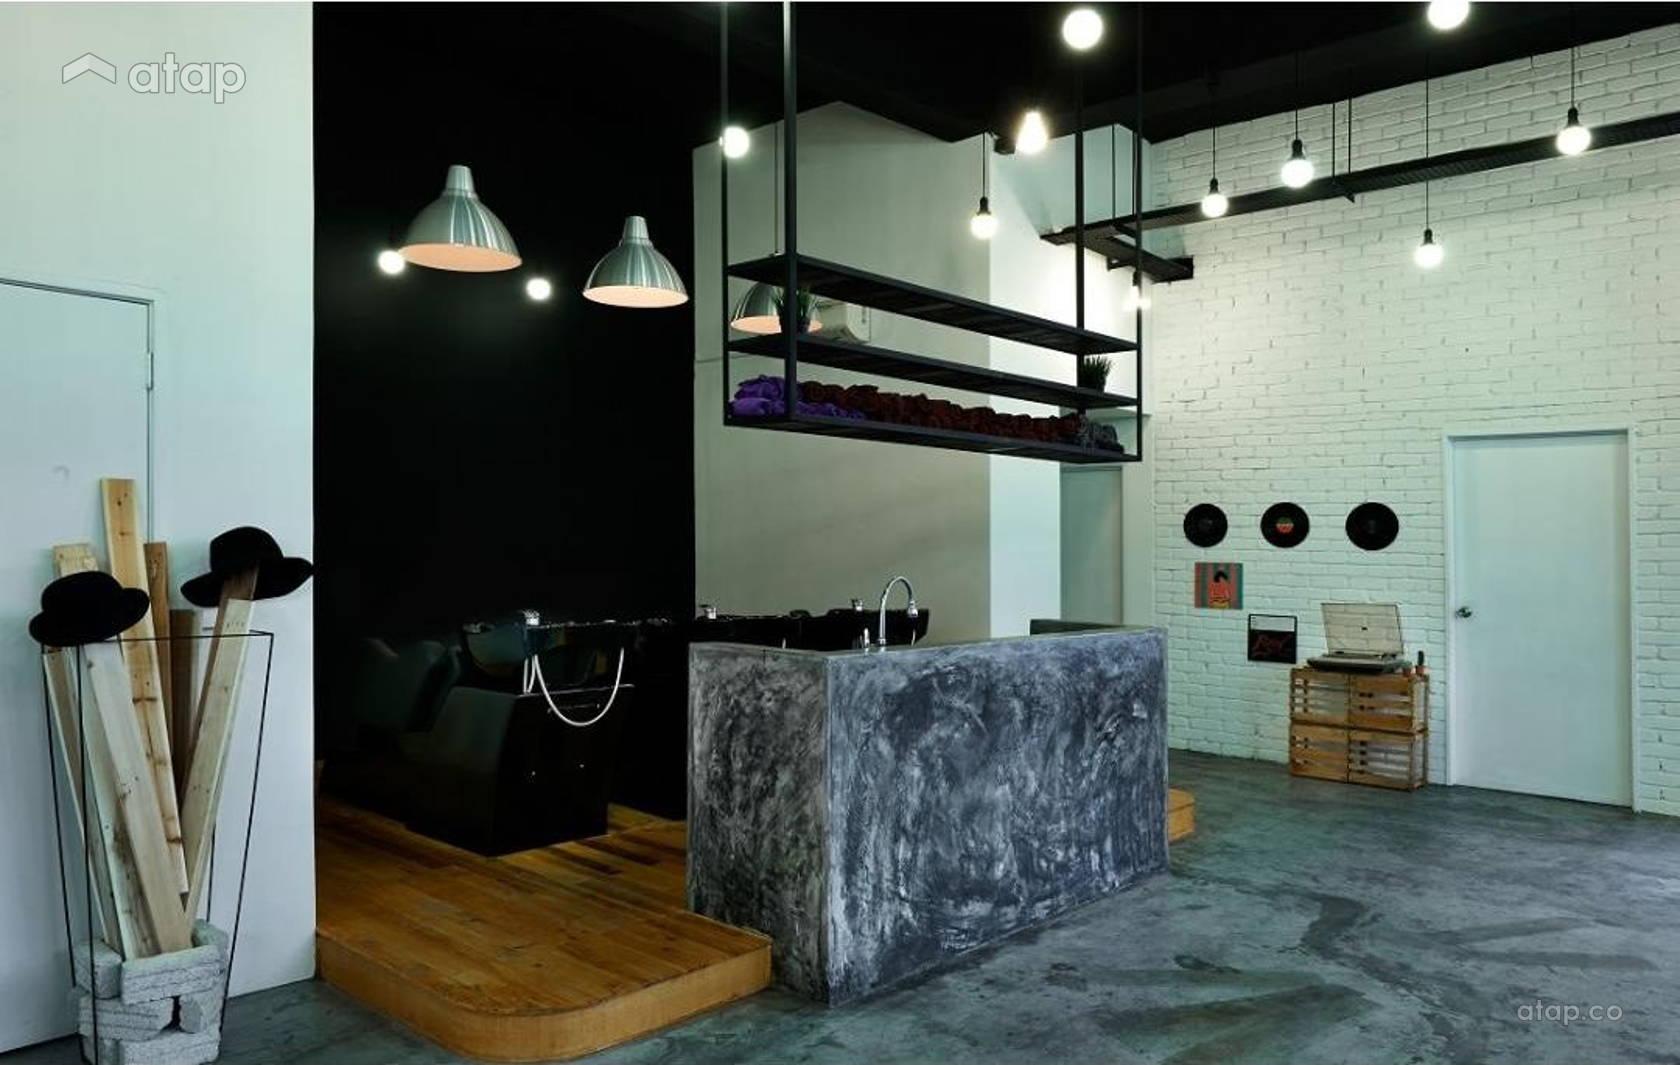 Superb The Editor Hair Salon Ground Floor Interior Design Renovation Ideas, Photos  And Price In Malaysia | Atap.co